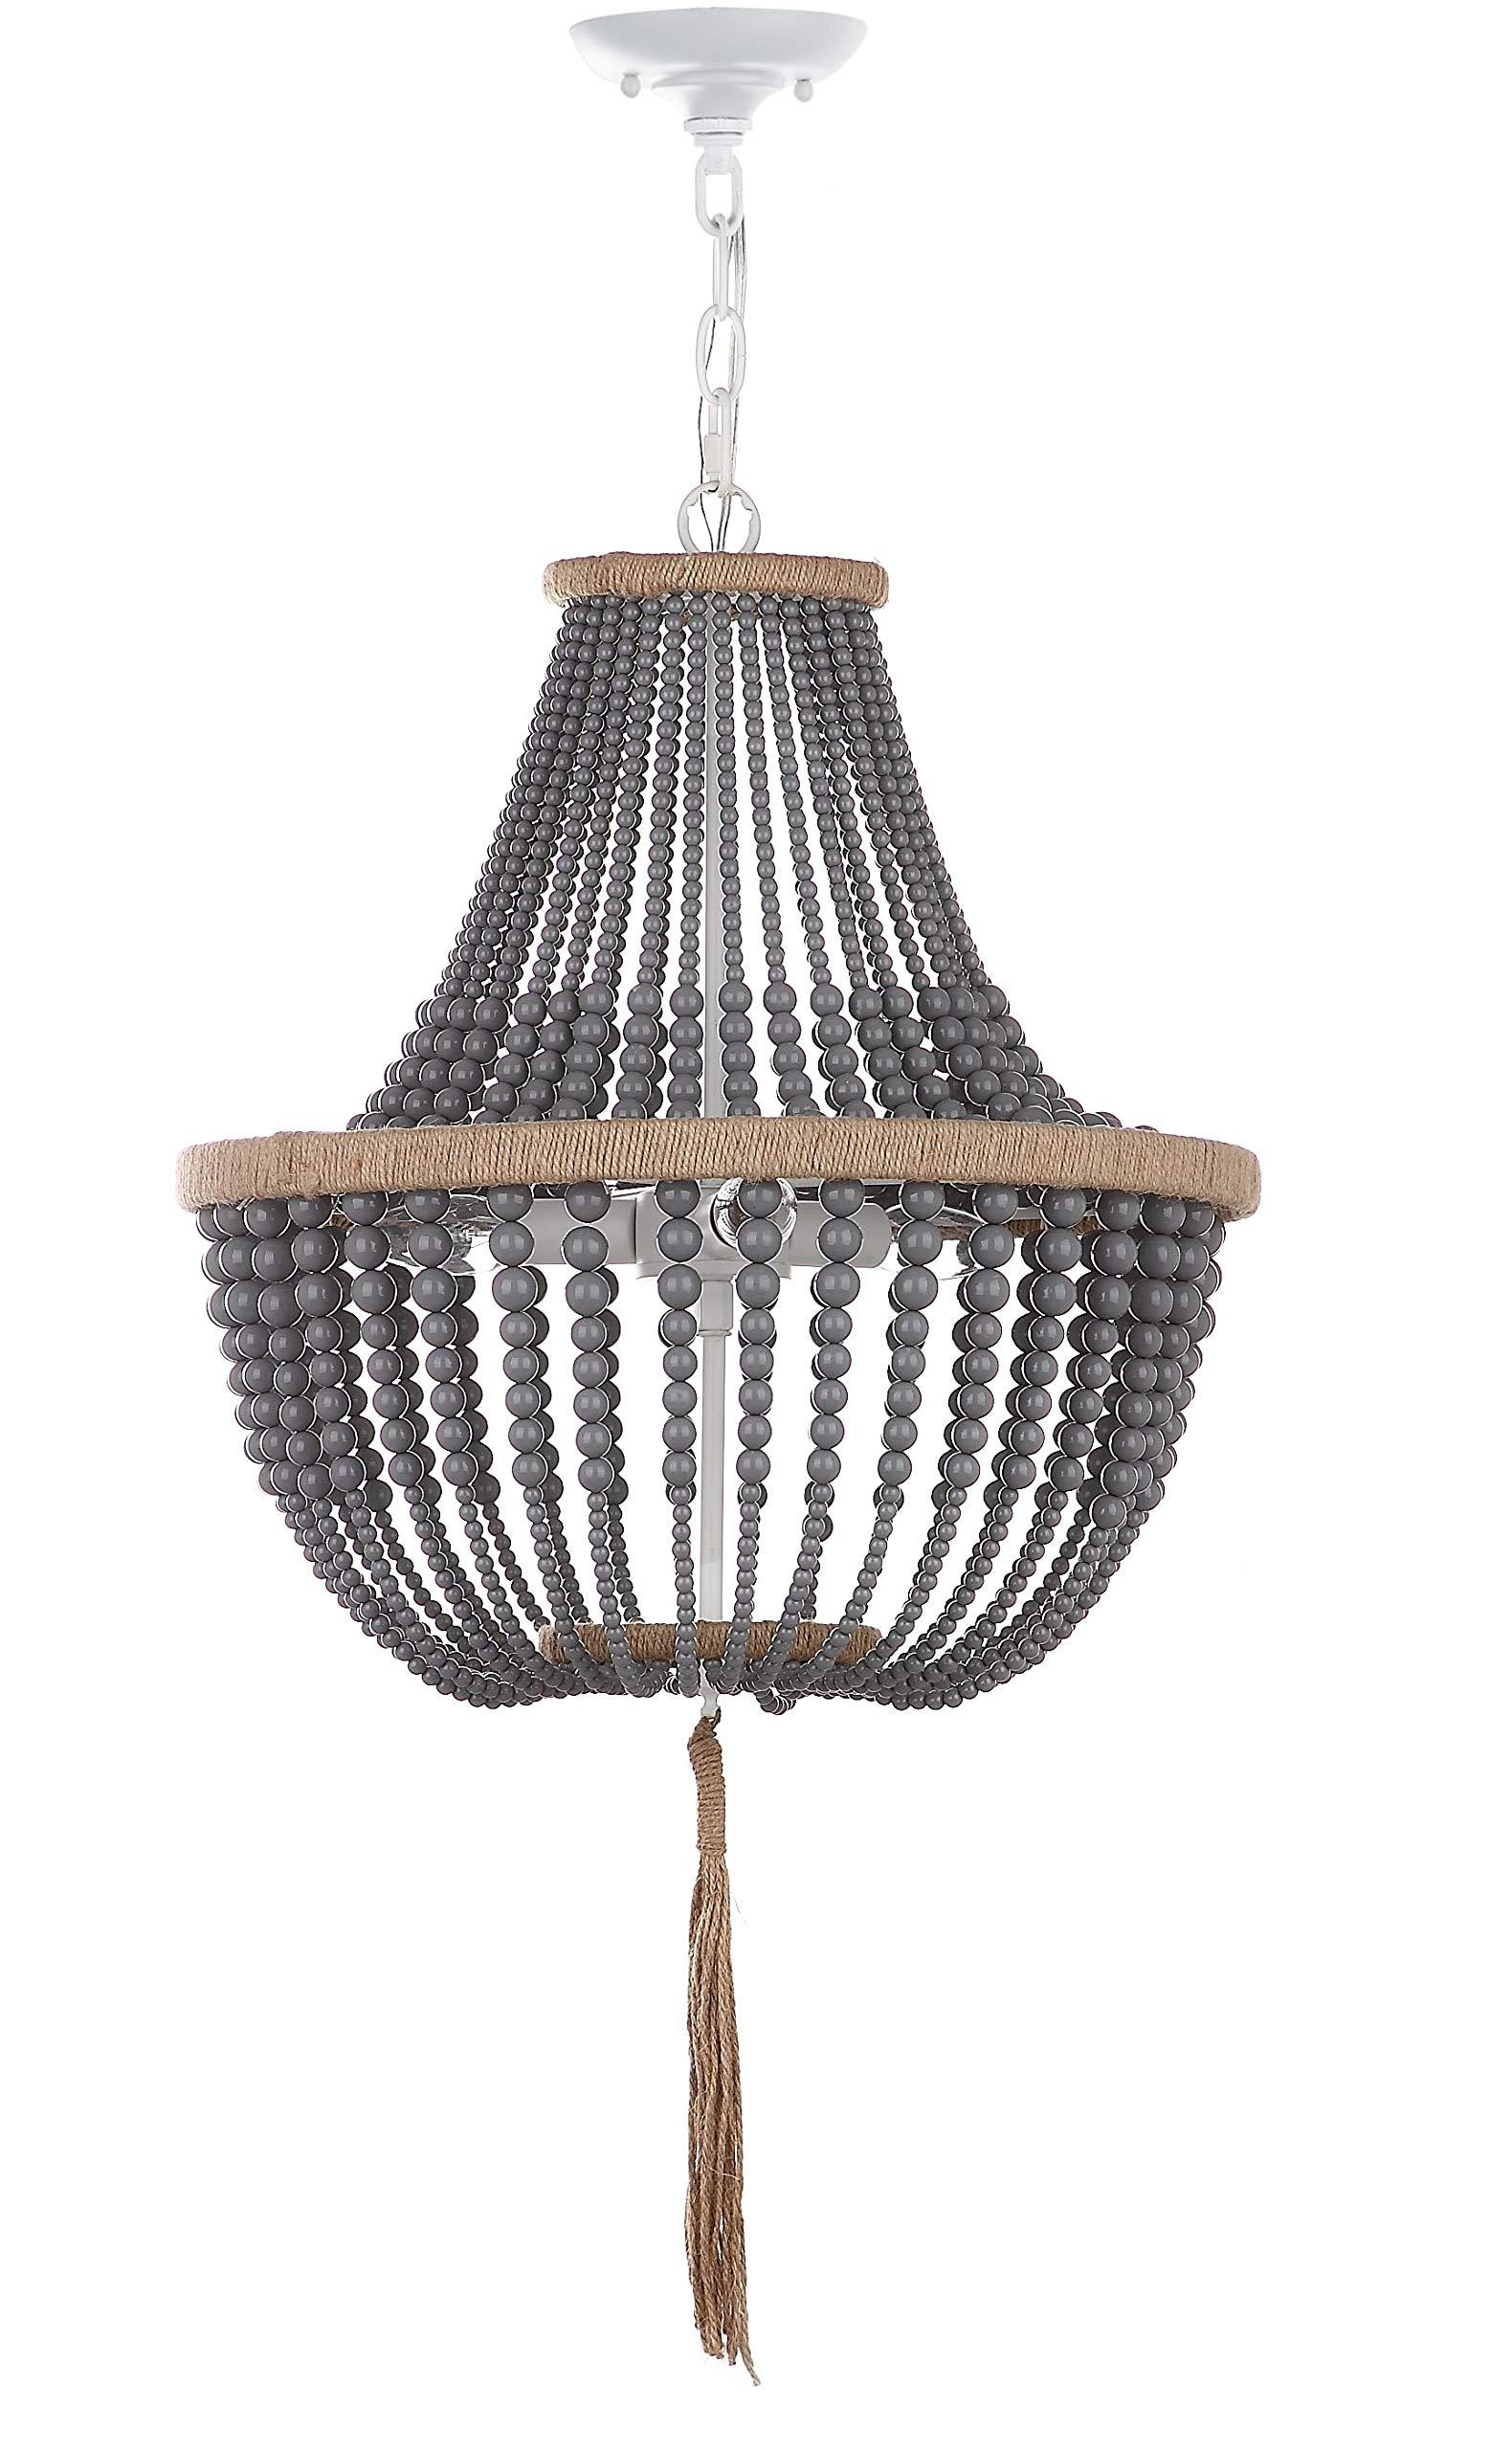 Safavieh'' Collection Lush Kristi 3 Light 16.5'' Beaded Pendant Grey